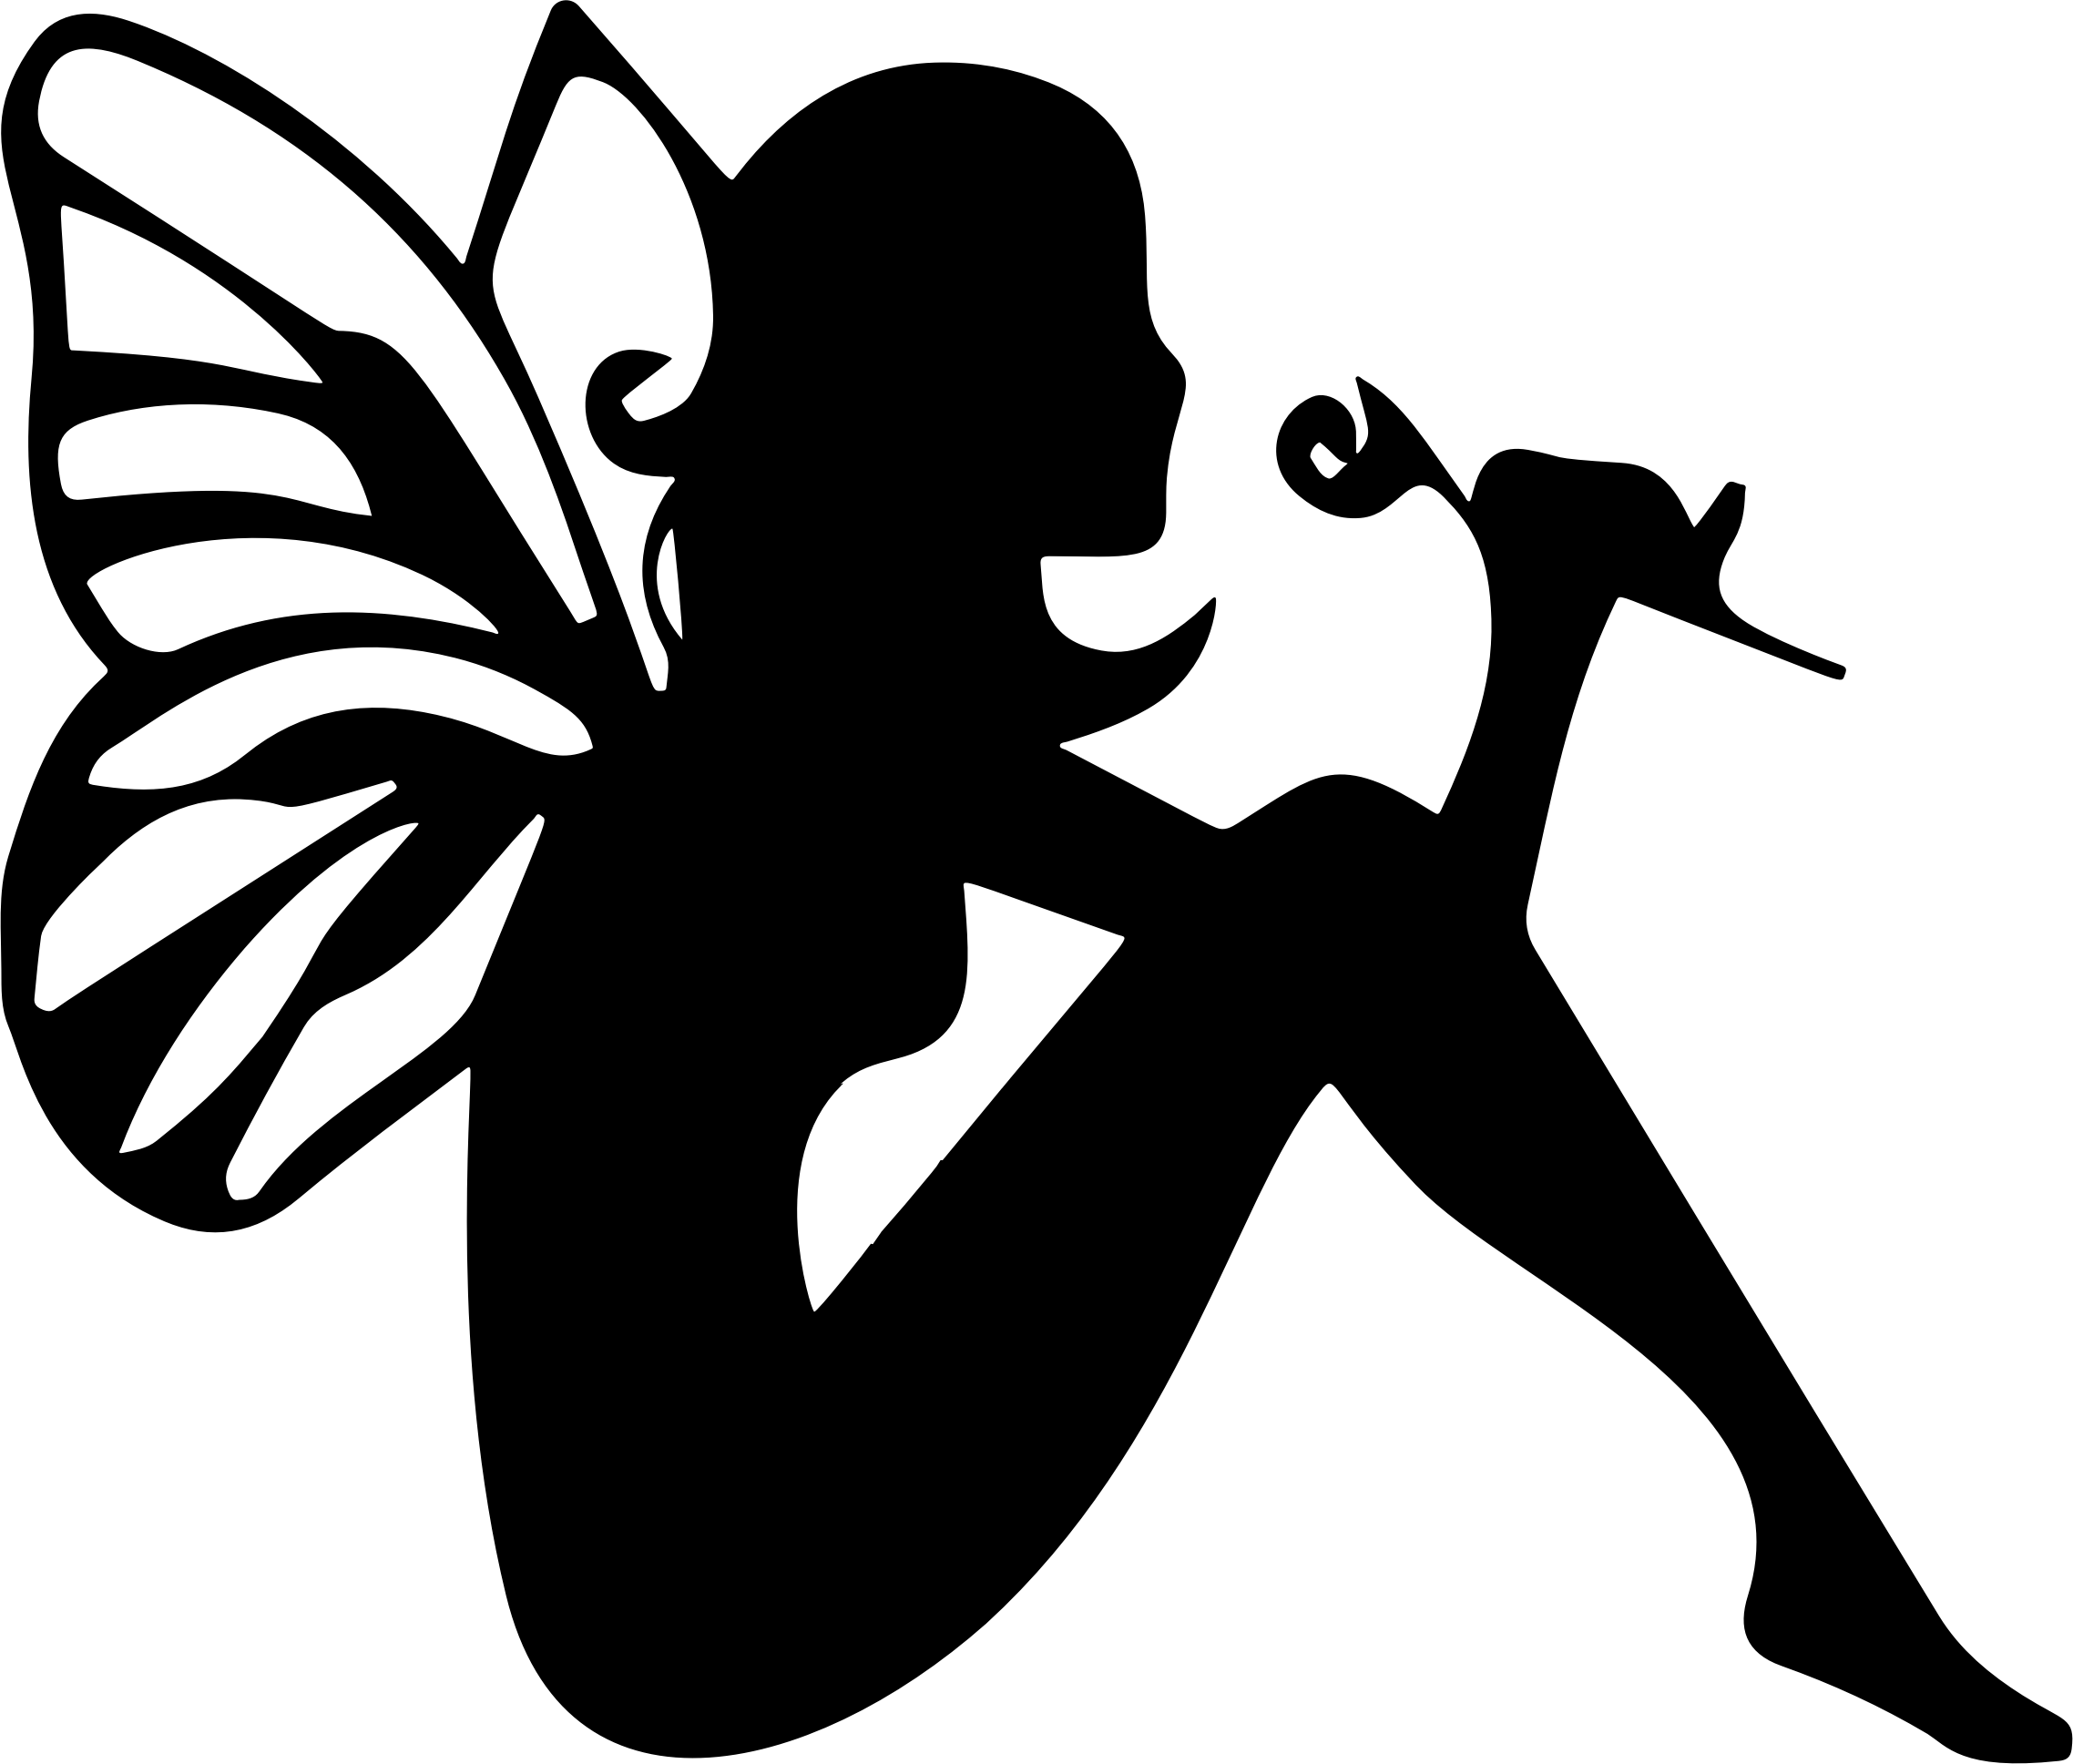 Fairy Silhouette Vector File Image